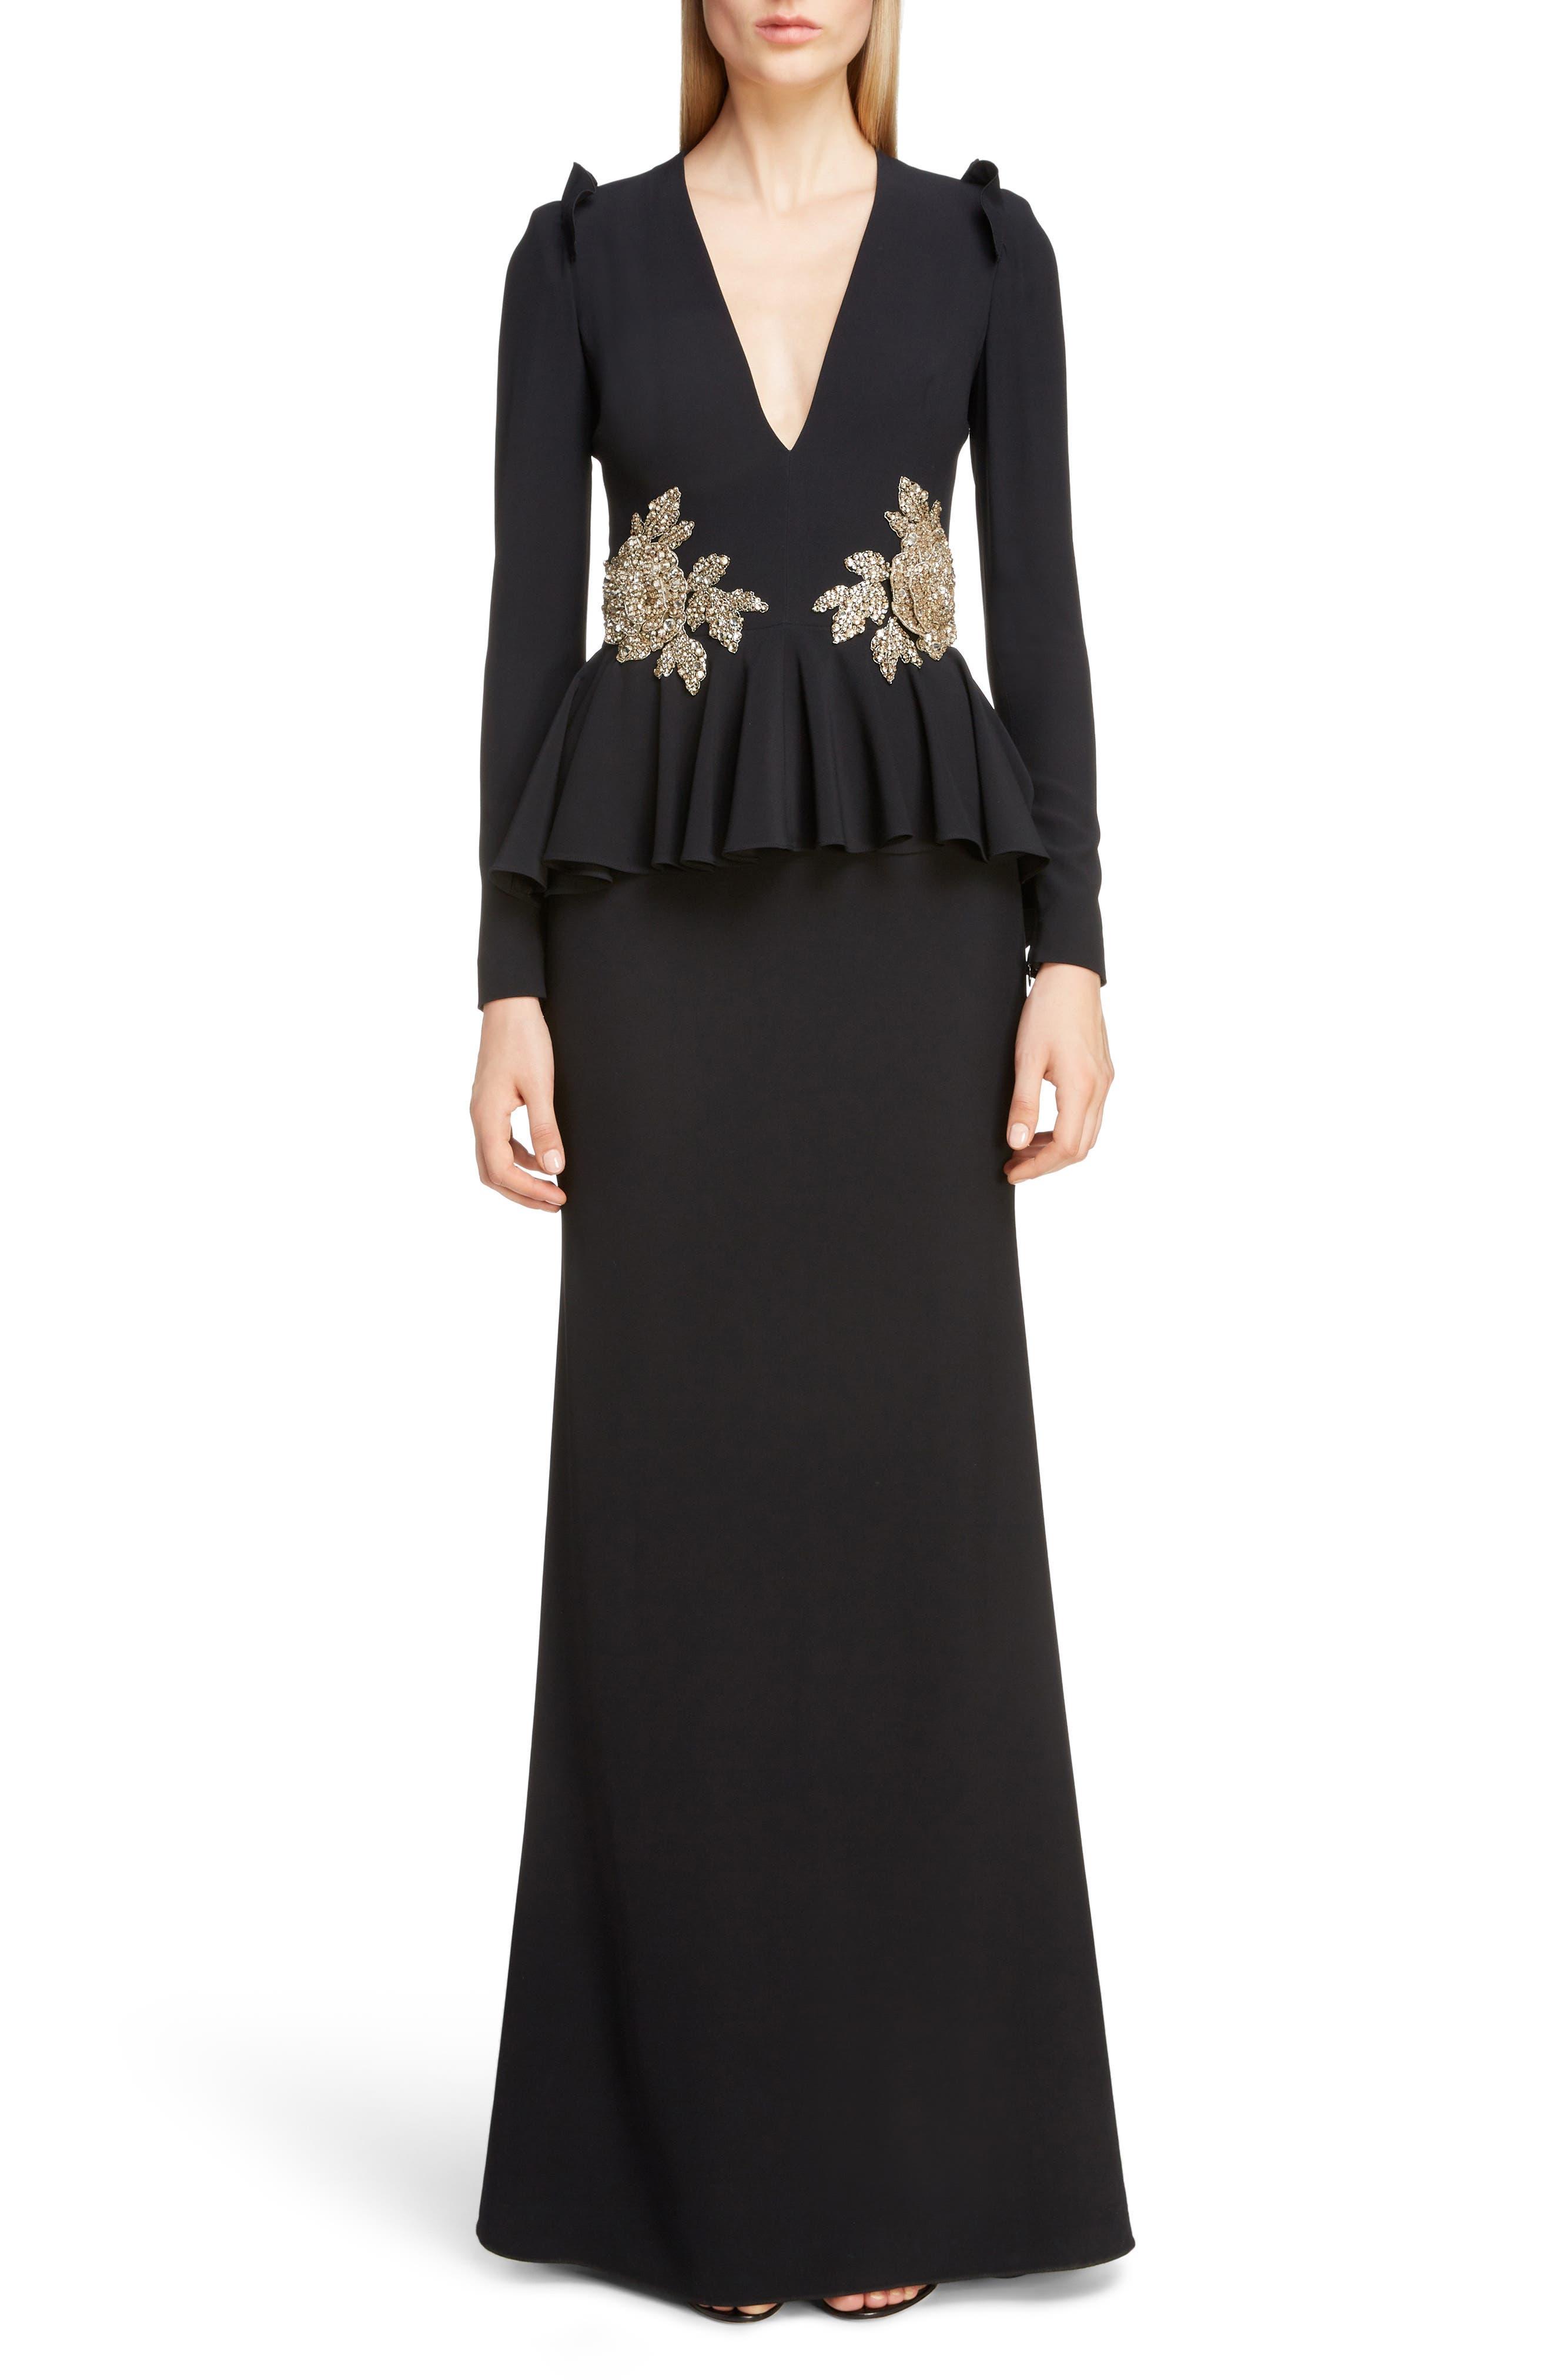 Alexander Mcqueen Embellished Peplum Waist Gown, US / 44 IT - Black